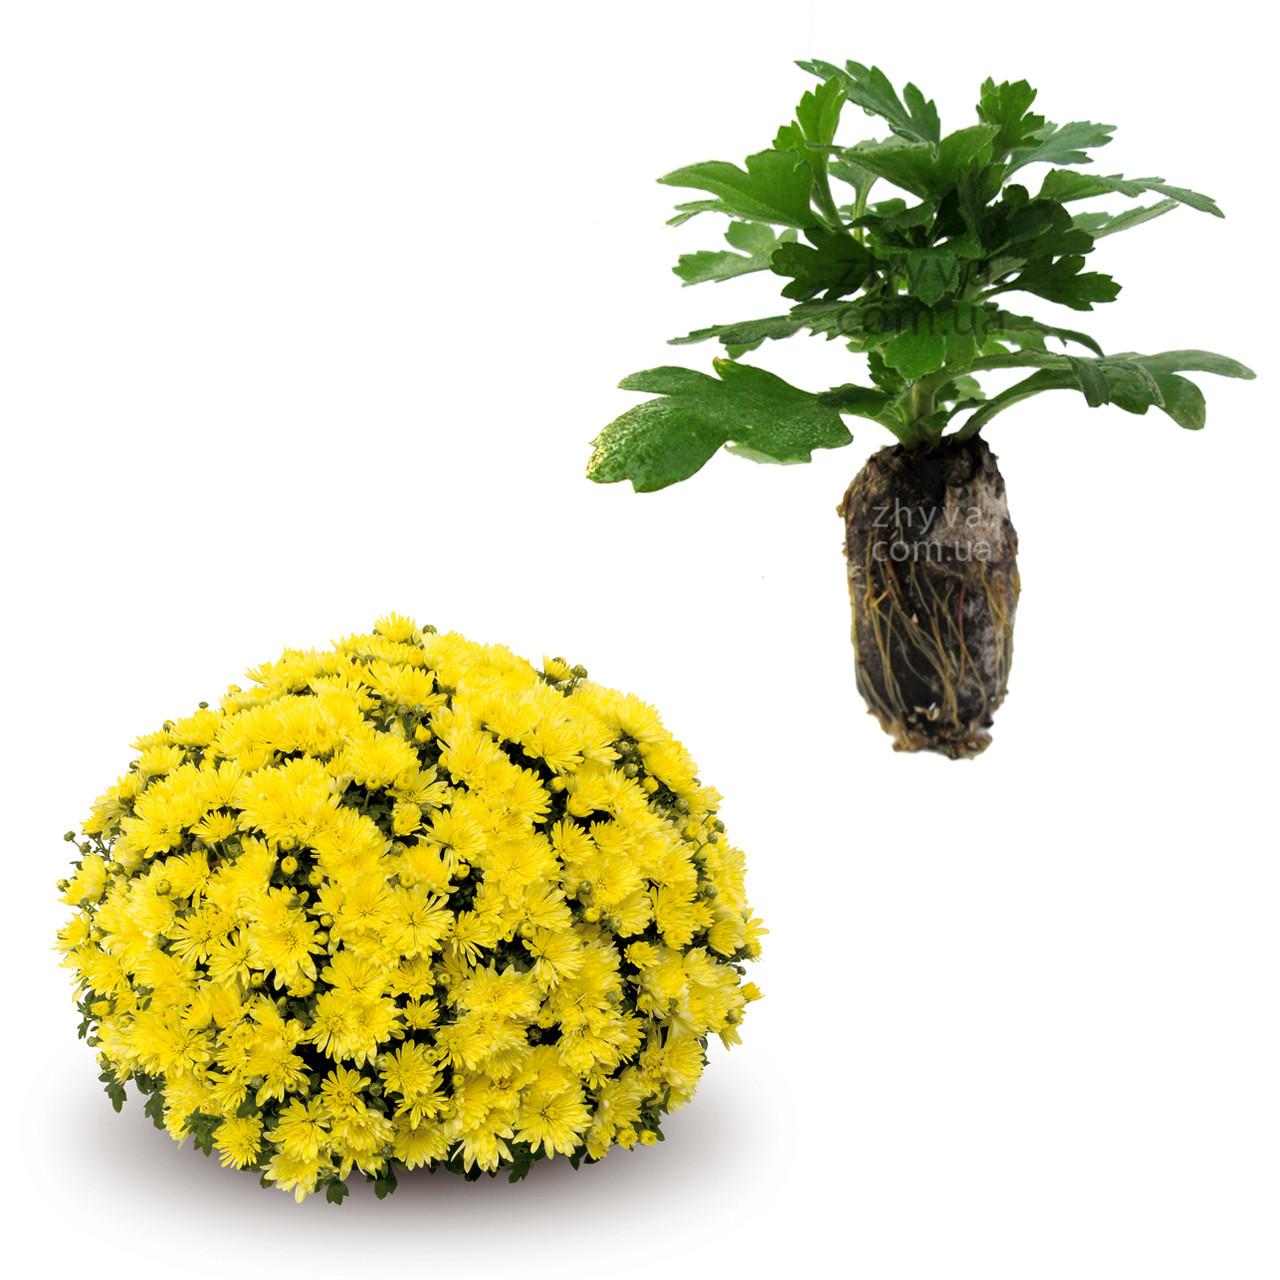 "Саджанці Хризантема Multiflora ""Aluga Yellow'' 1шт / Рассада Хризантема Multiflora ""Aluga Yellow''"